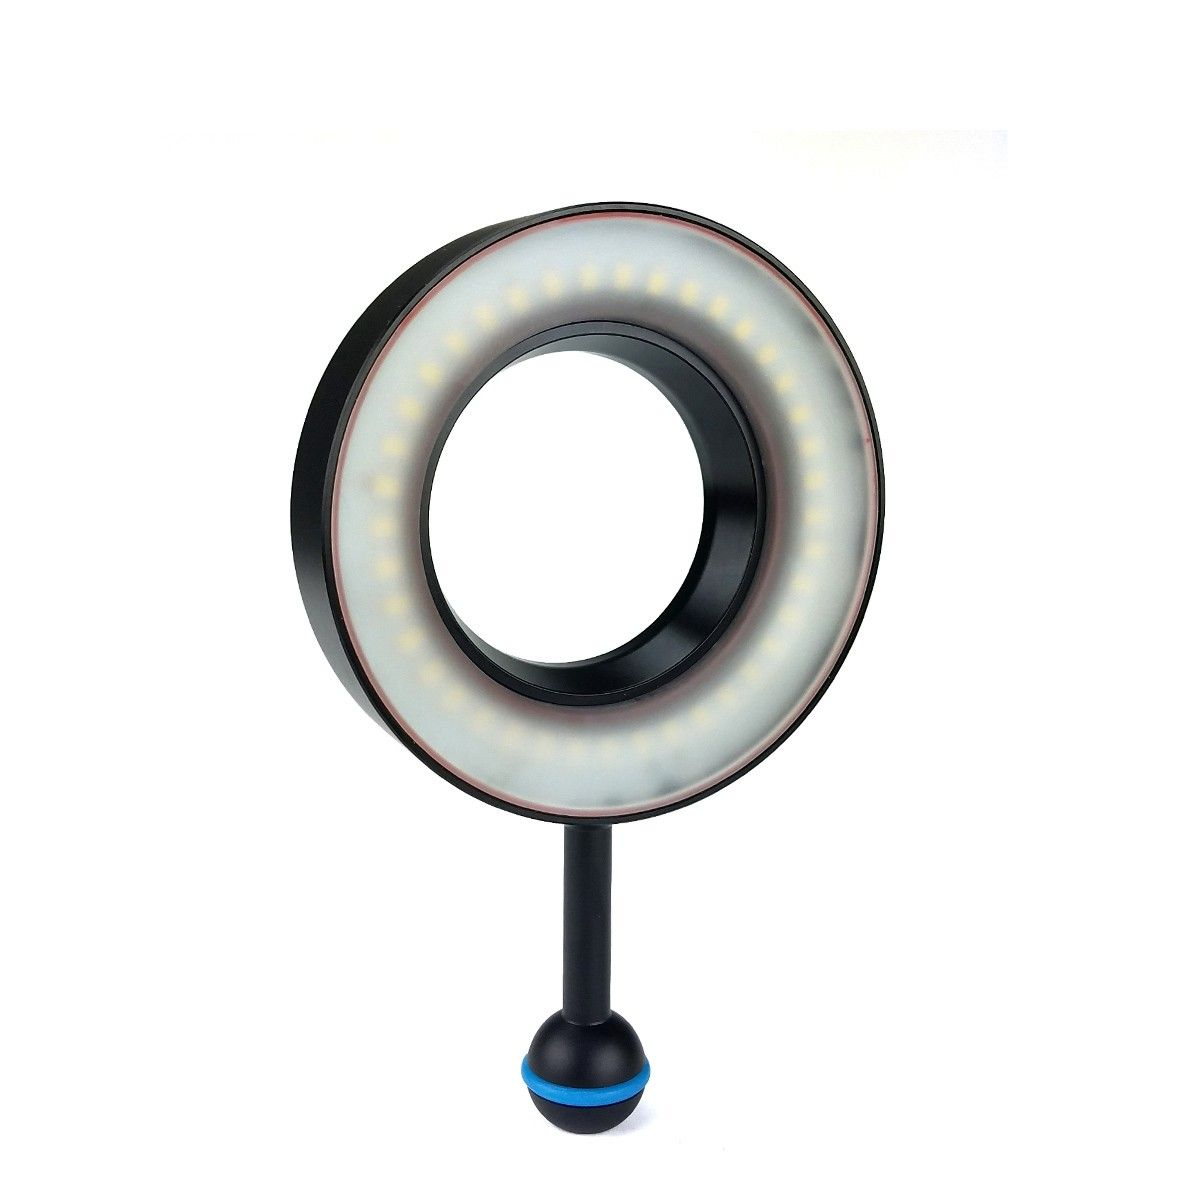 SL-108 Underwater Diving Macro Ring Flash Light Fill Lighting For Sony A7 II A7R II Fujifilm X100F Waterproof Housing Case